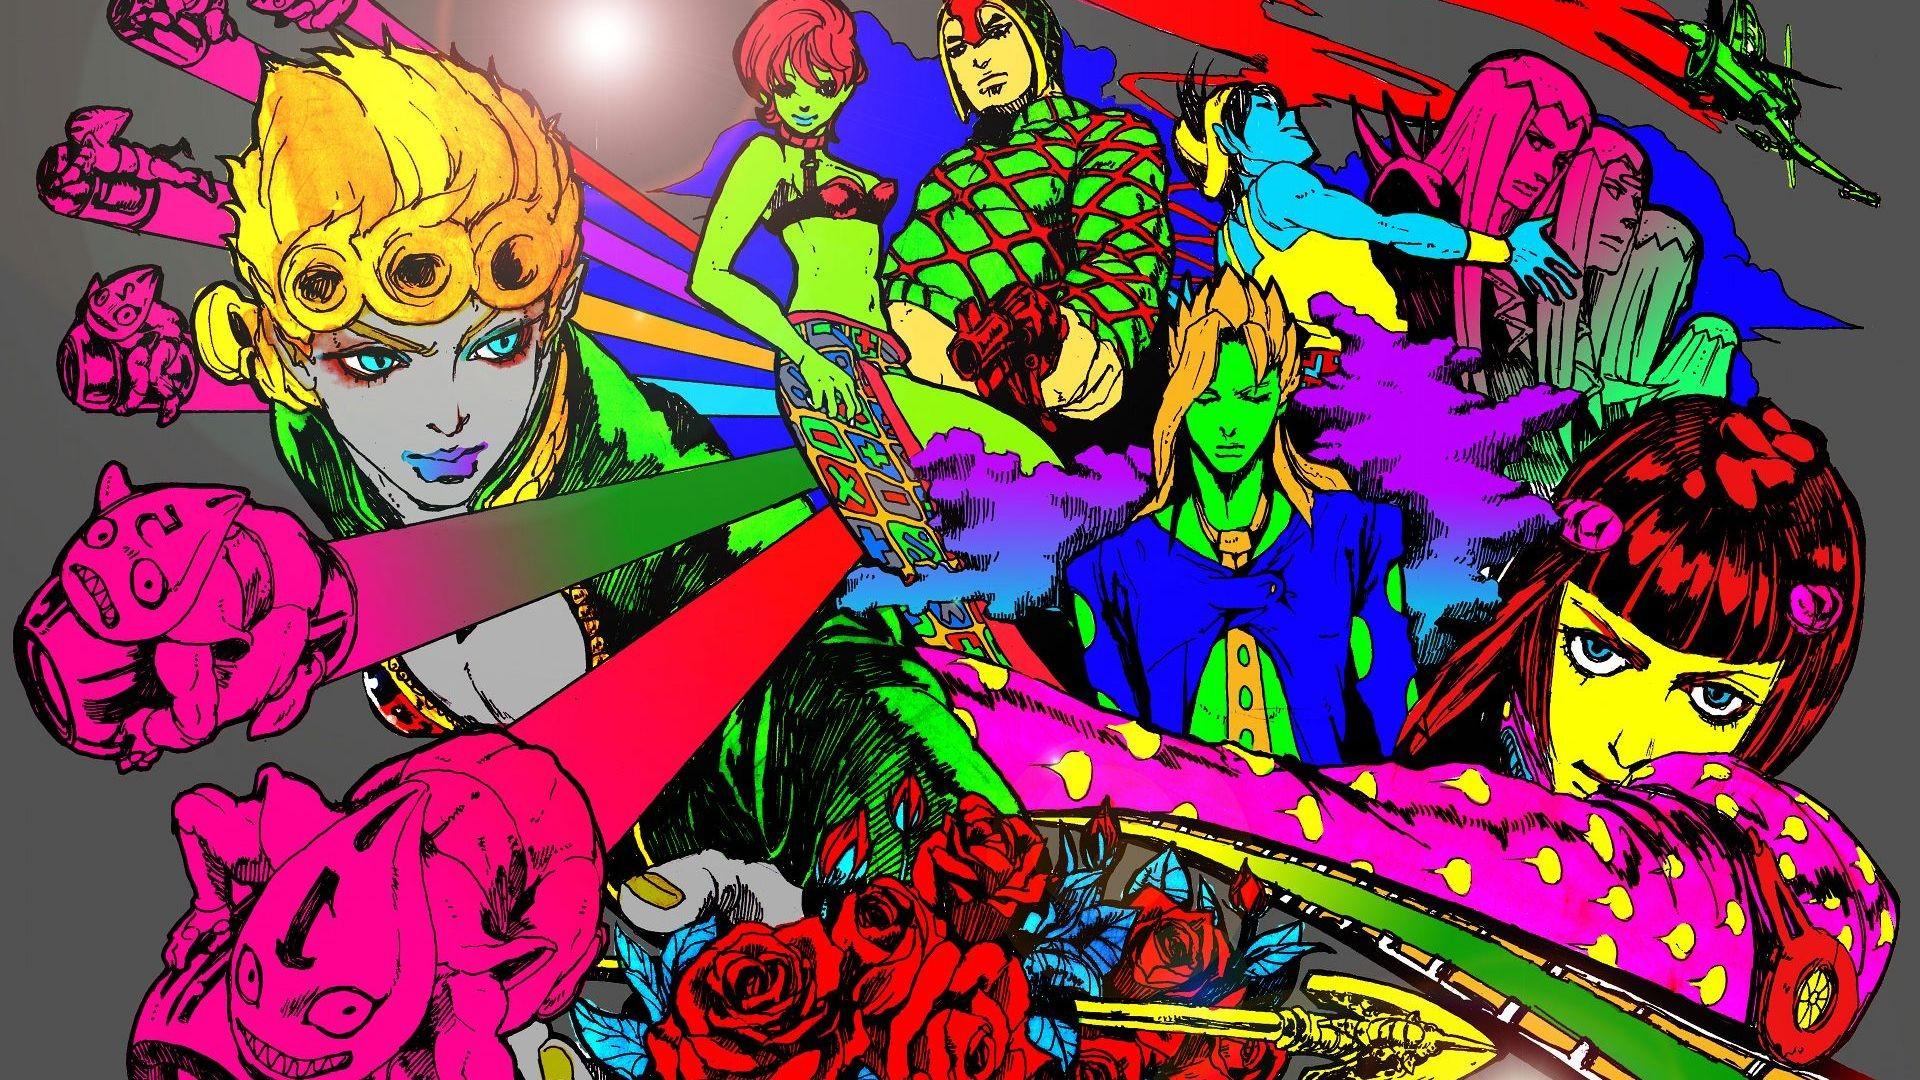 Jojo\'s Bizarre Adventure wallpaper ·① Download free awesome ...